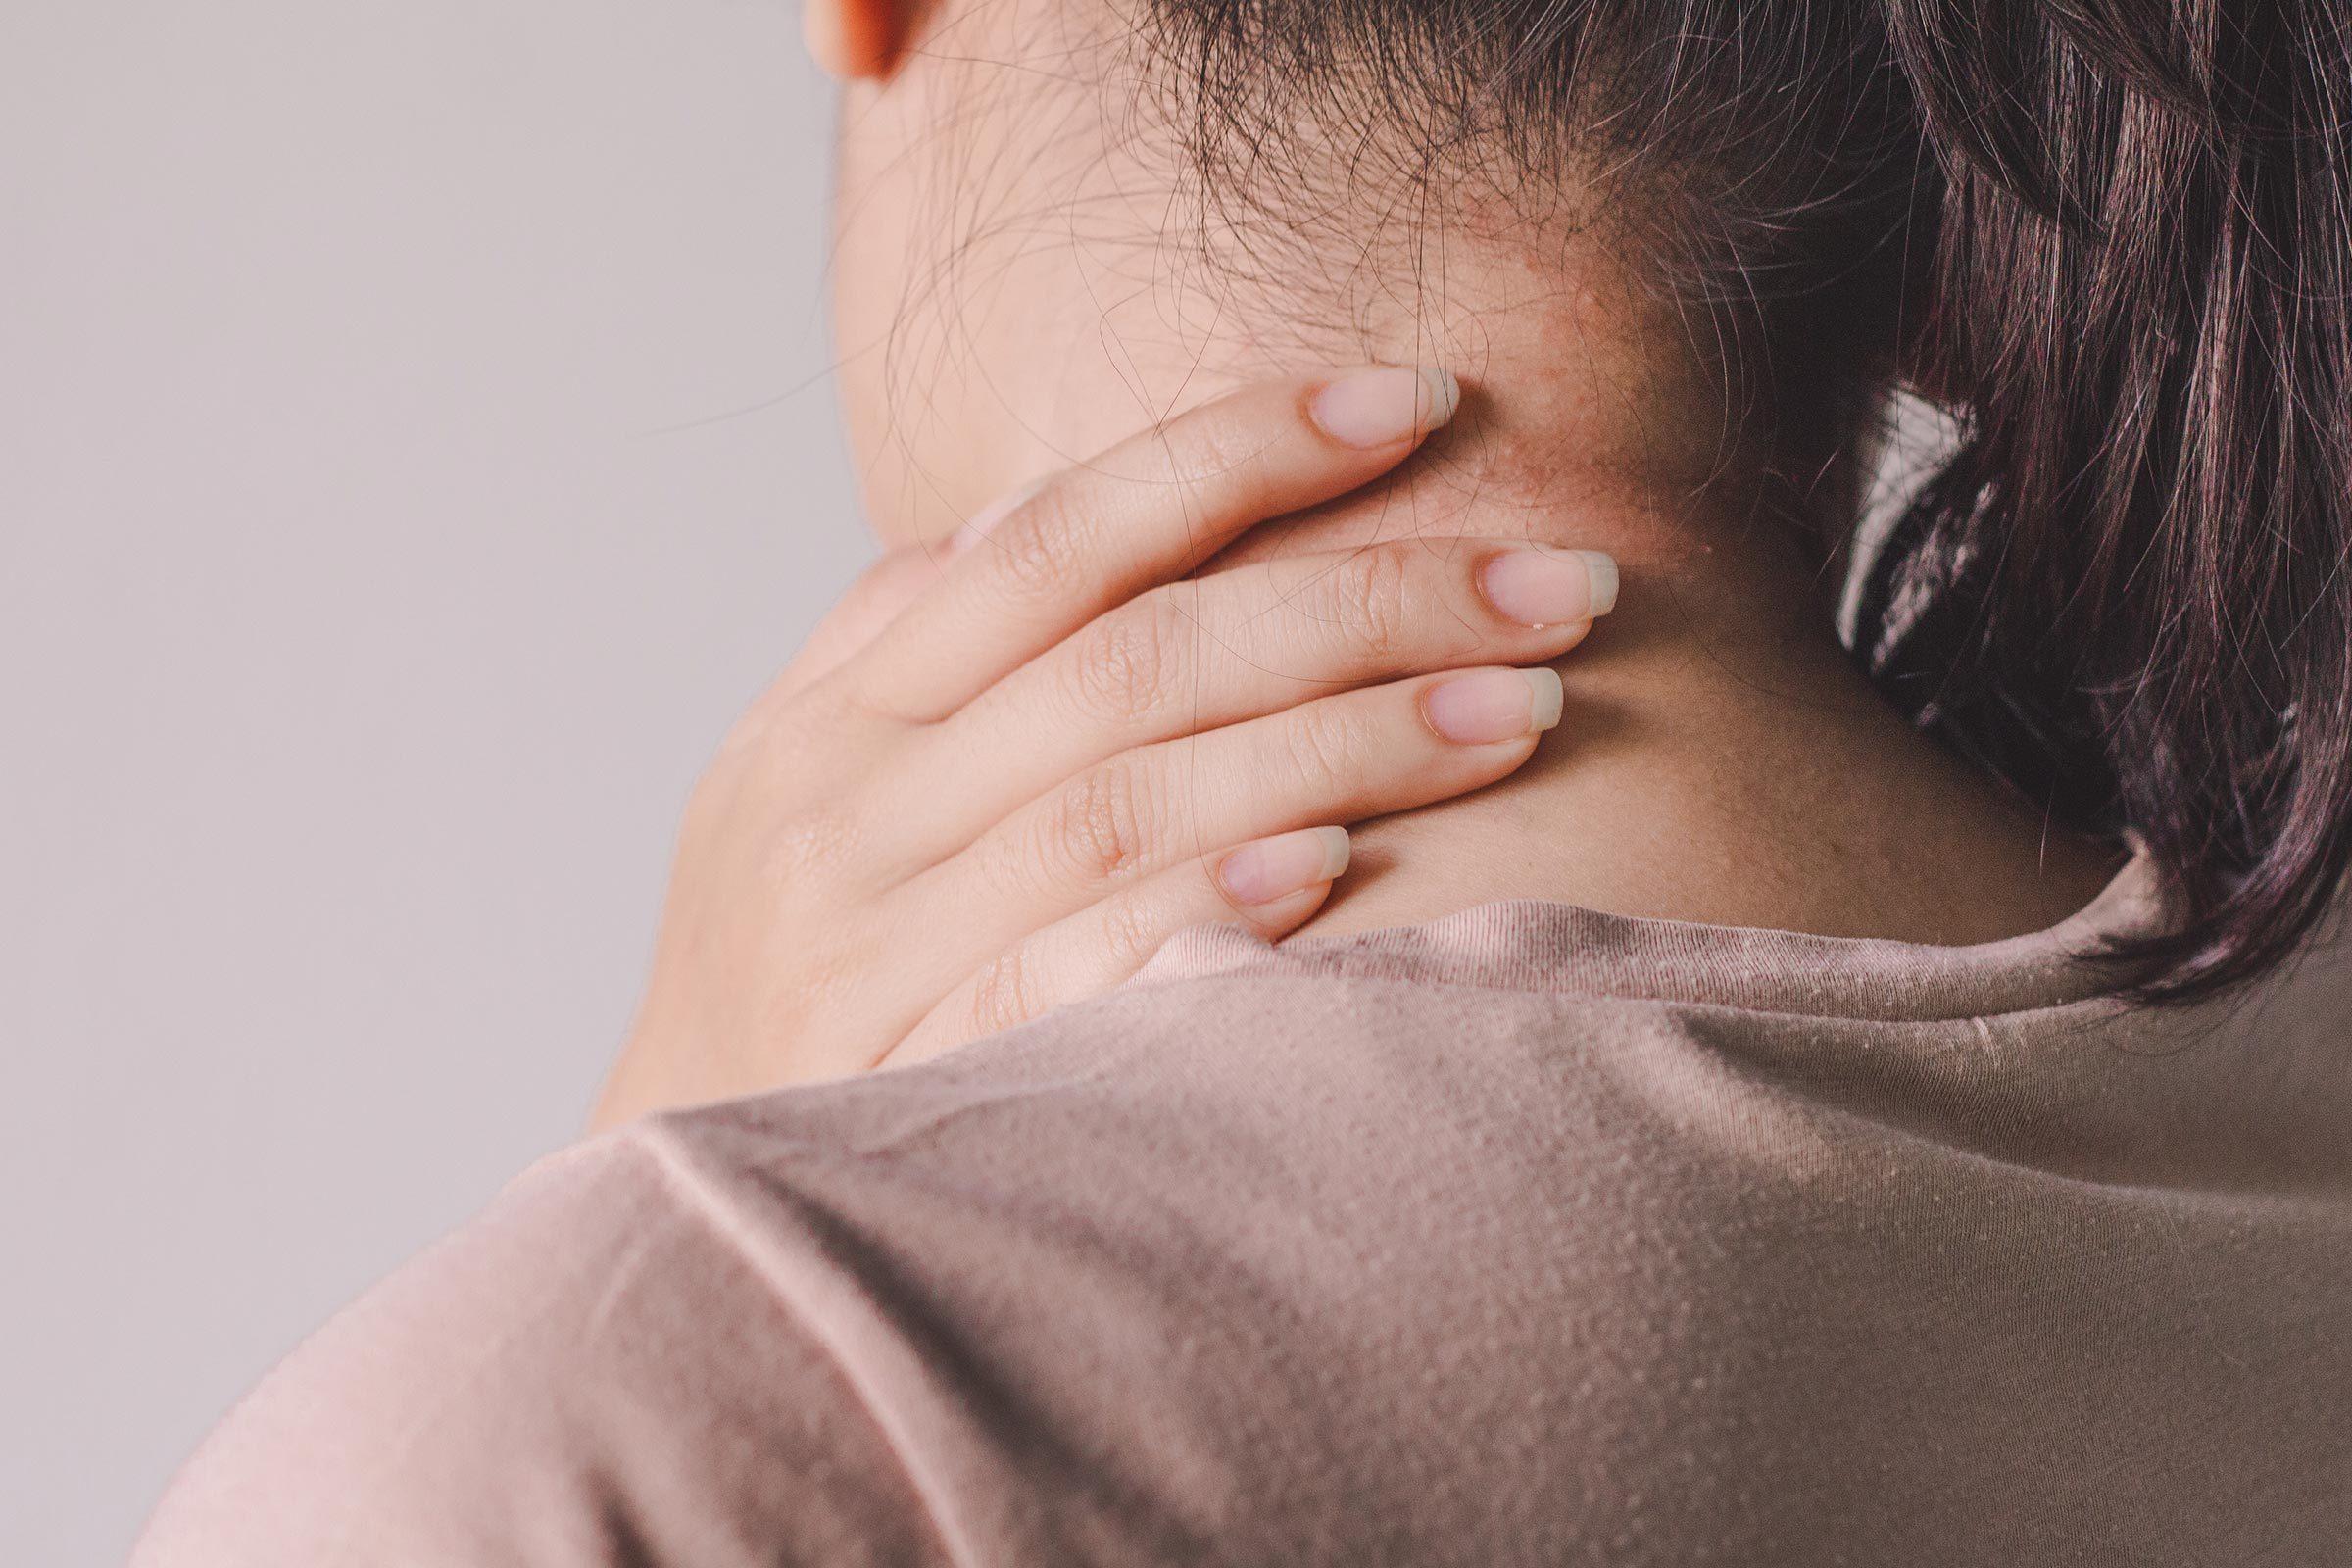 neck rash